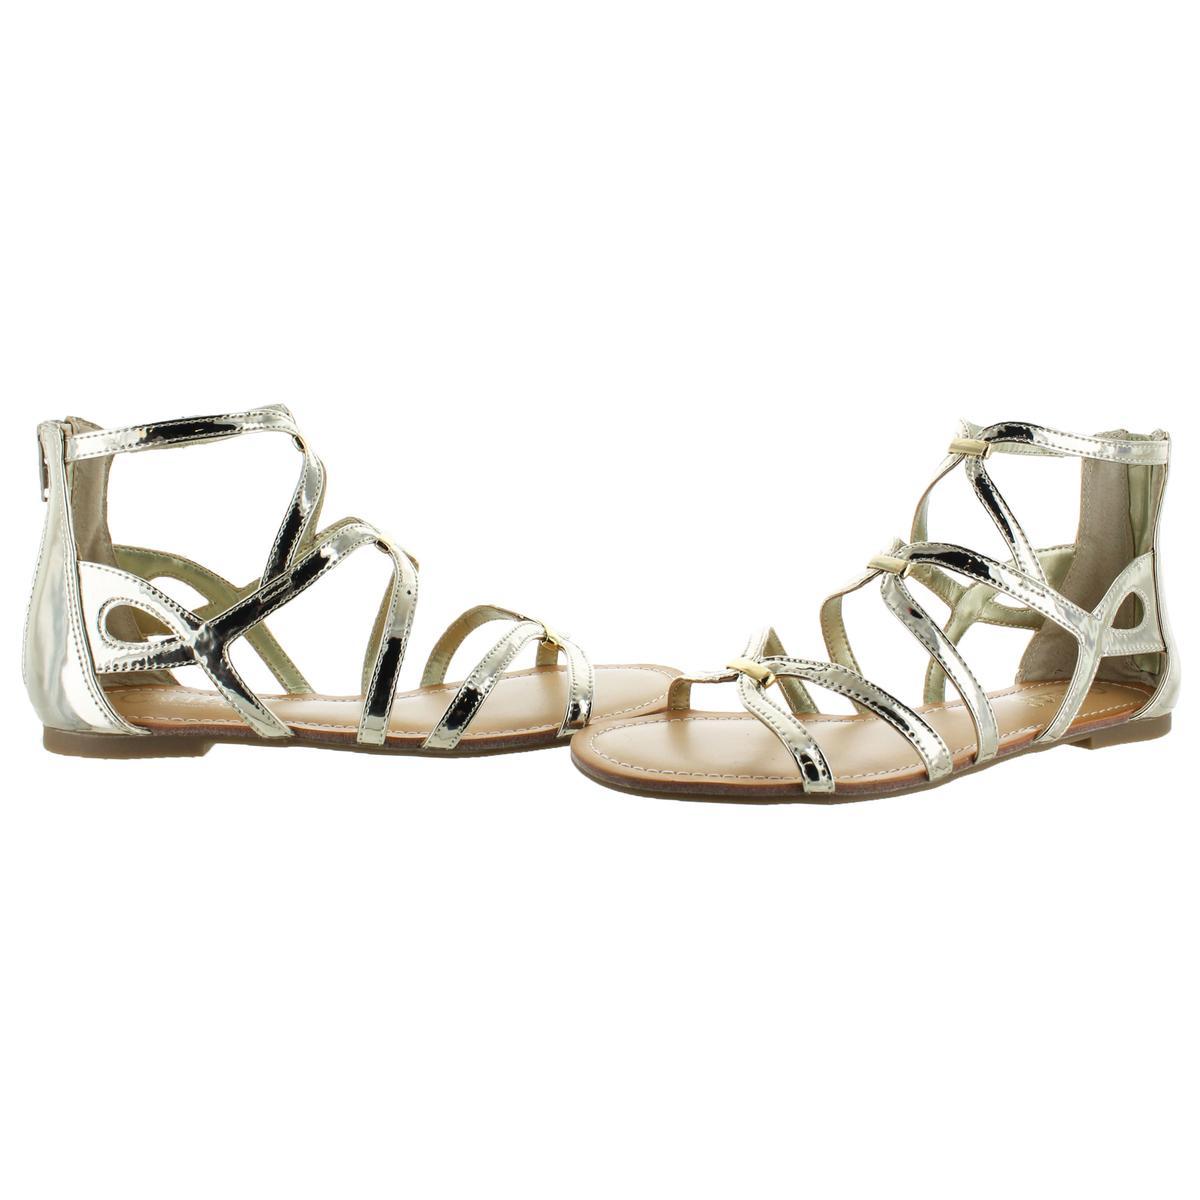 Carlos-by-Carlos-Santana-Emma-Women-039-s-Open-Toe-Caged-Strappy-Casual-Flat-Sandals thumbnail 3